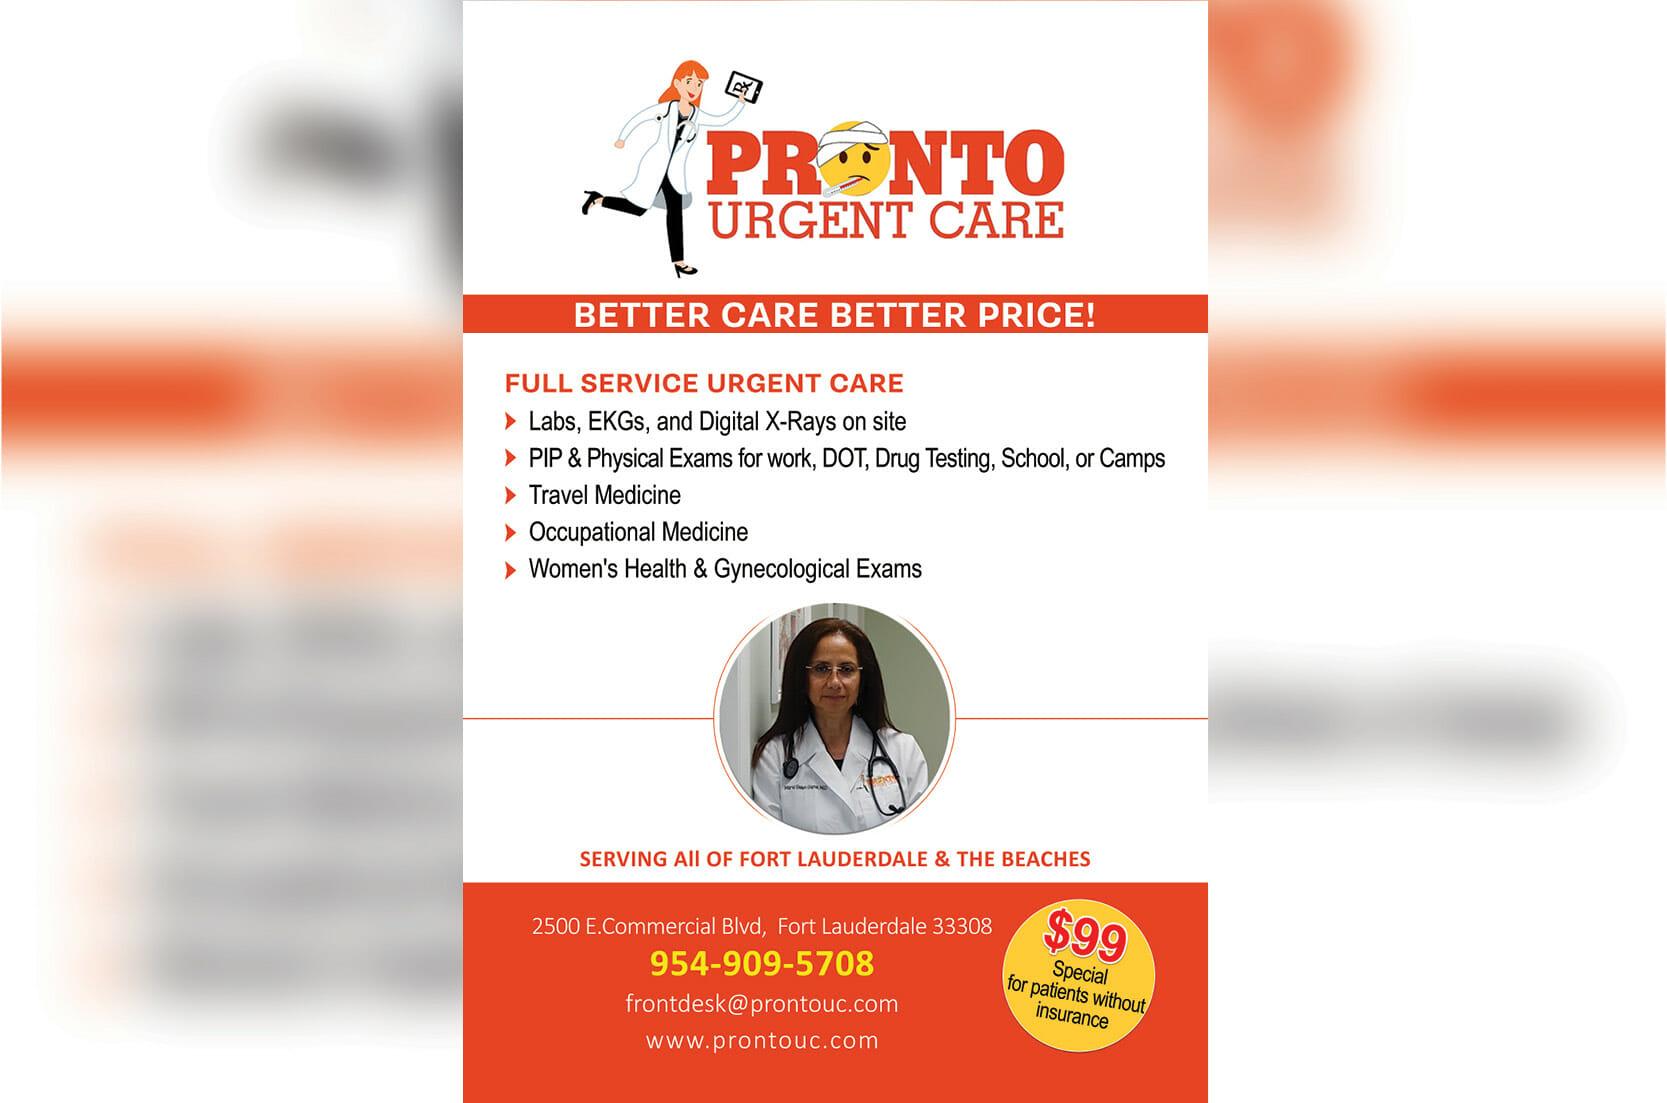 Get Your Urgent Care - Pronto!